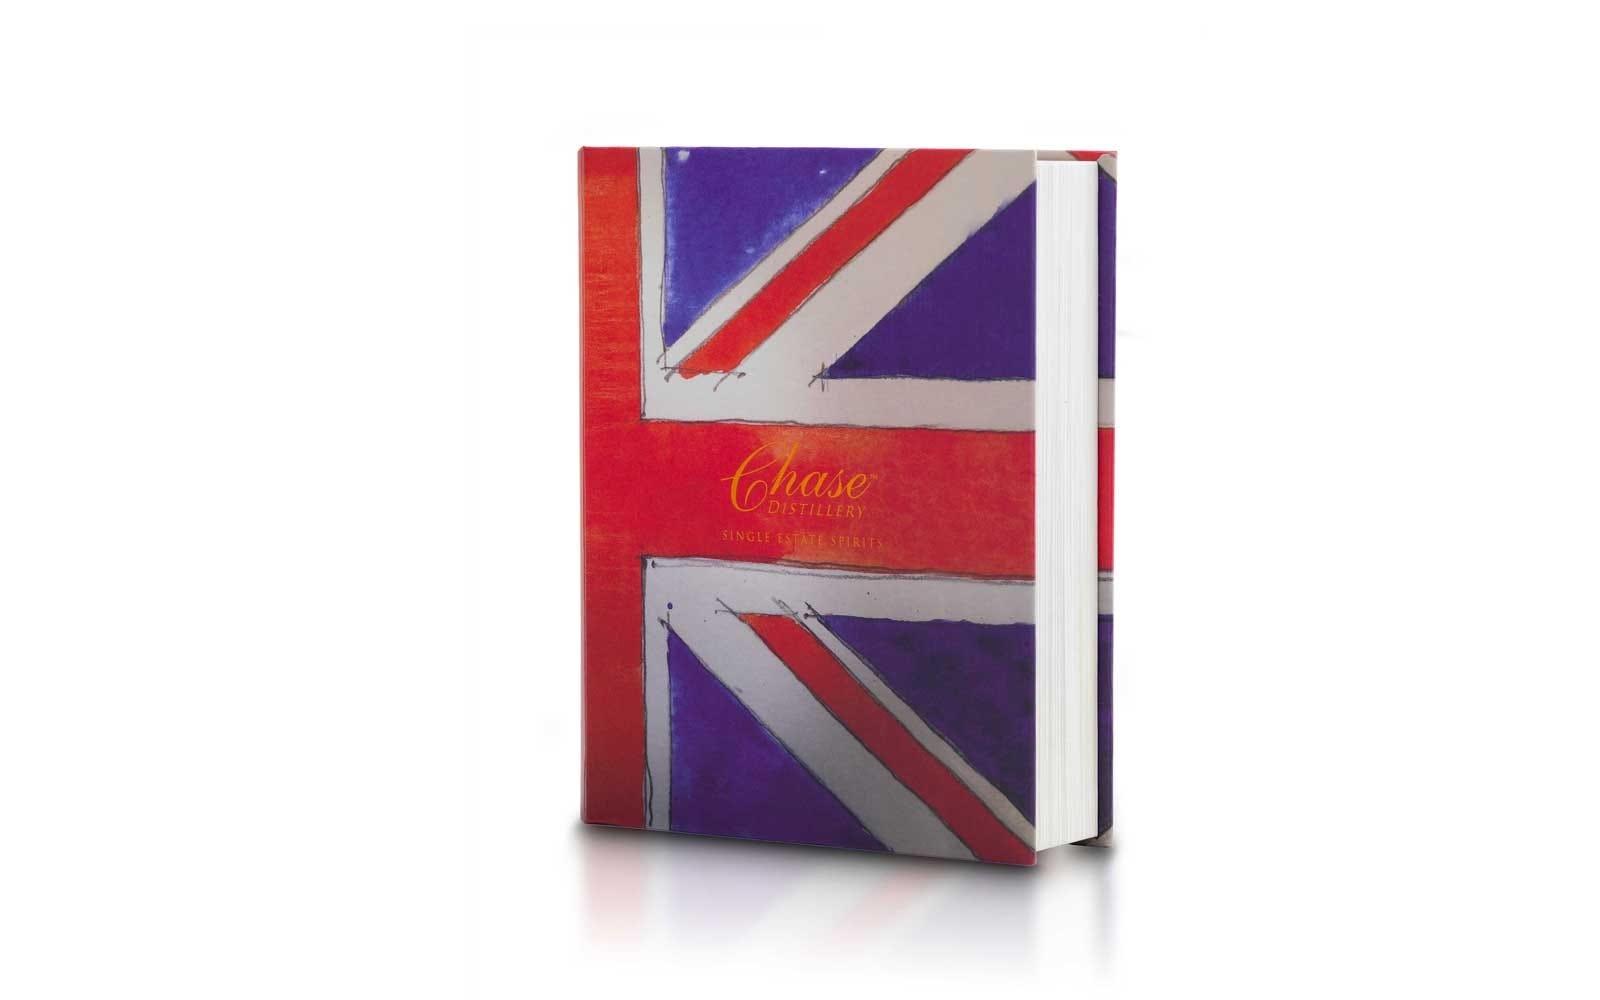 Chase trio set Union Jack presentation book